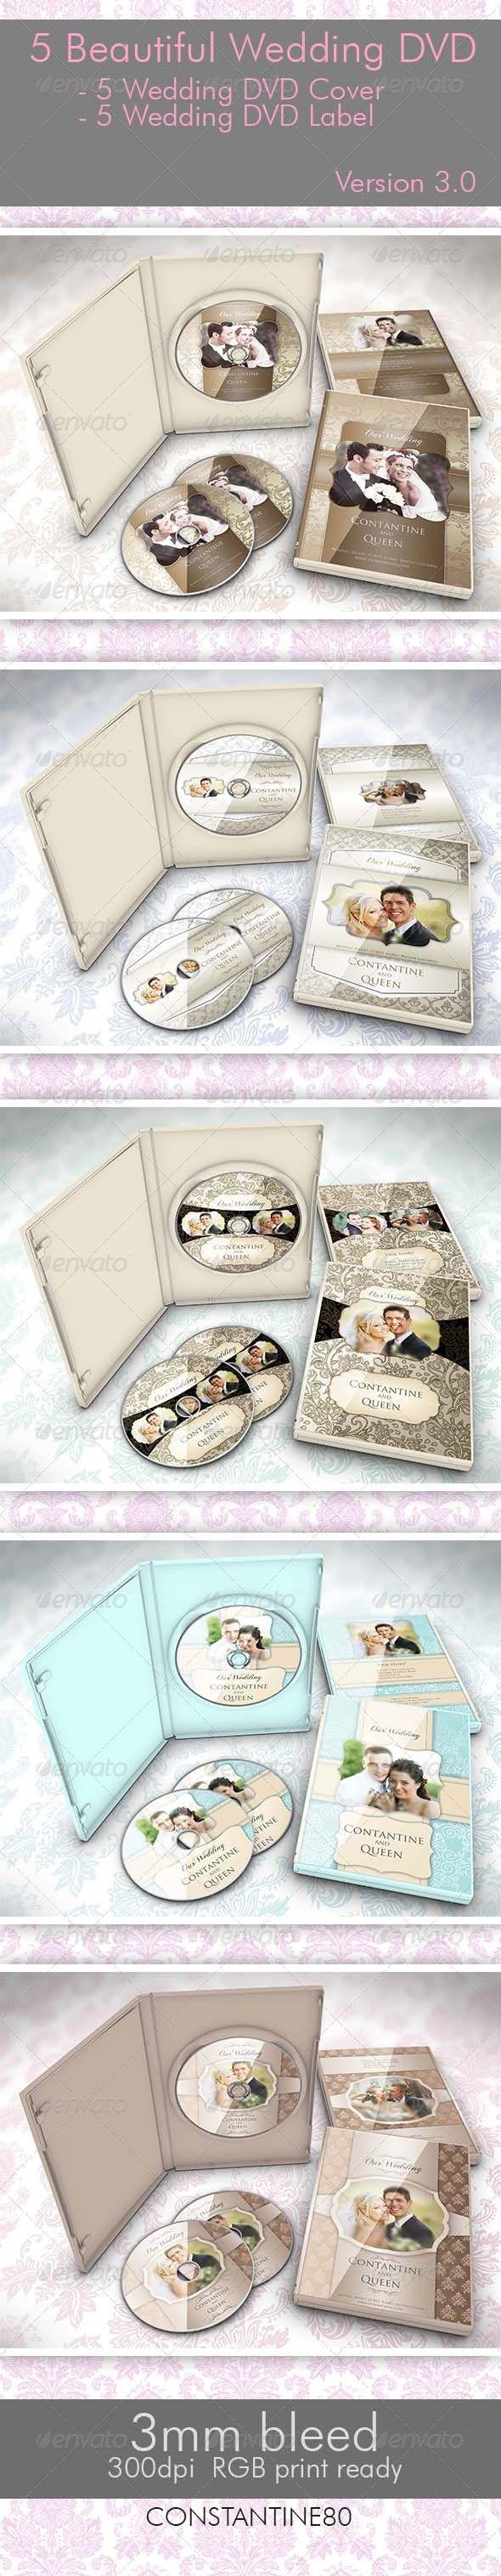 wedding invitation design psd%0A   Beautiful Wedding DVD Ver      Print TemplatesPsd TemplatesInvitation